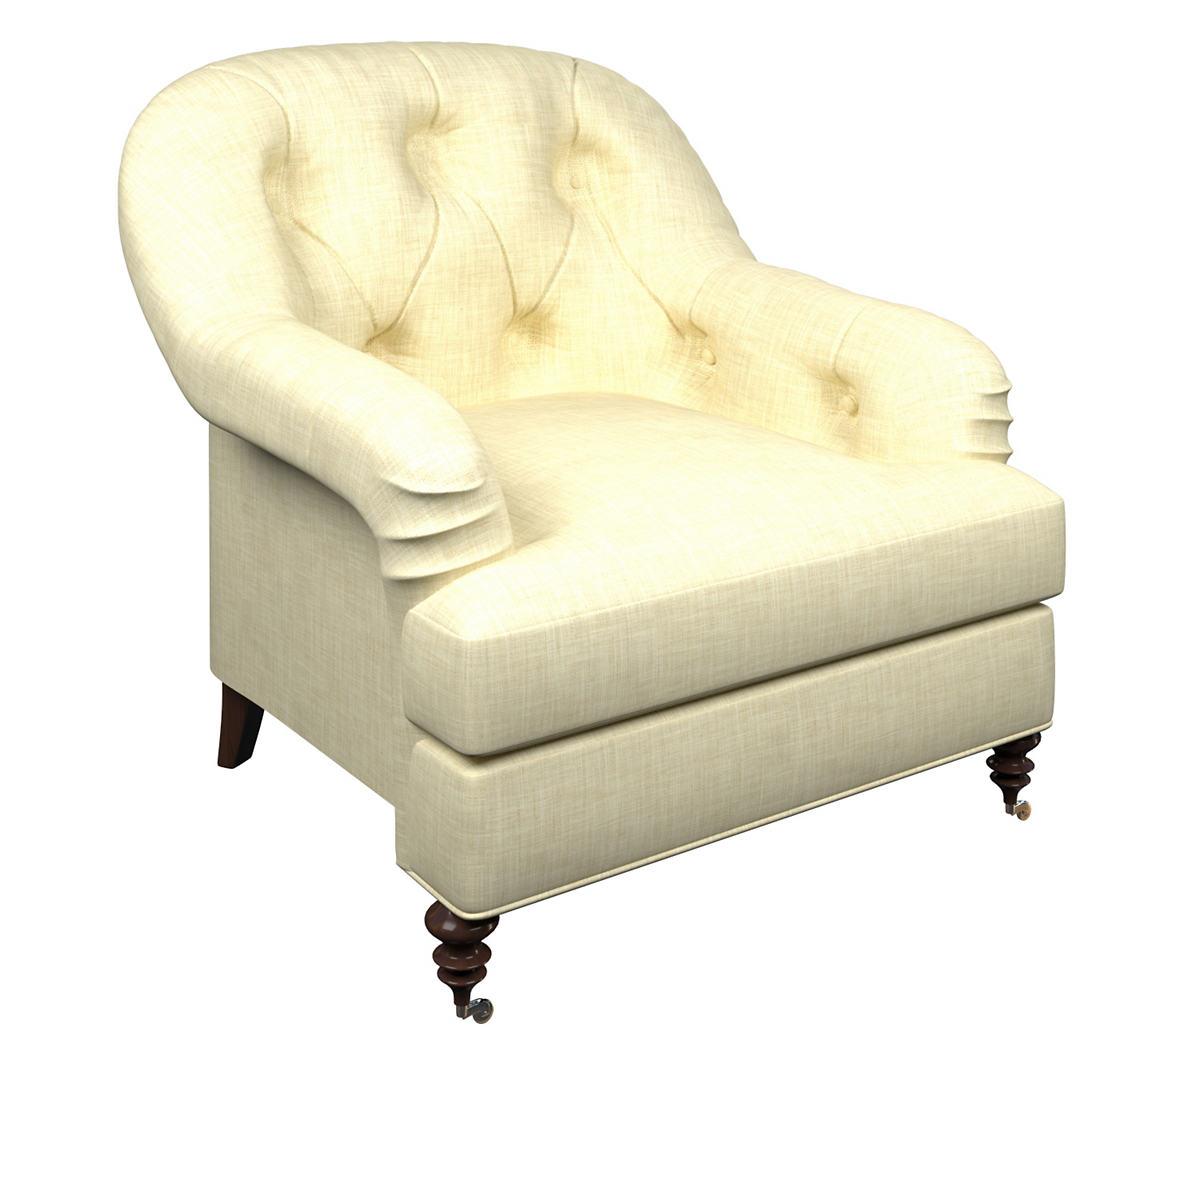 Greylock Ivory Norfolk Chair